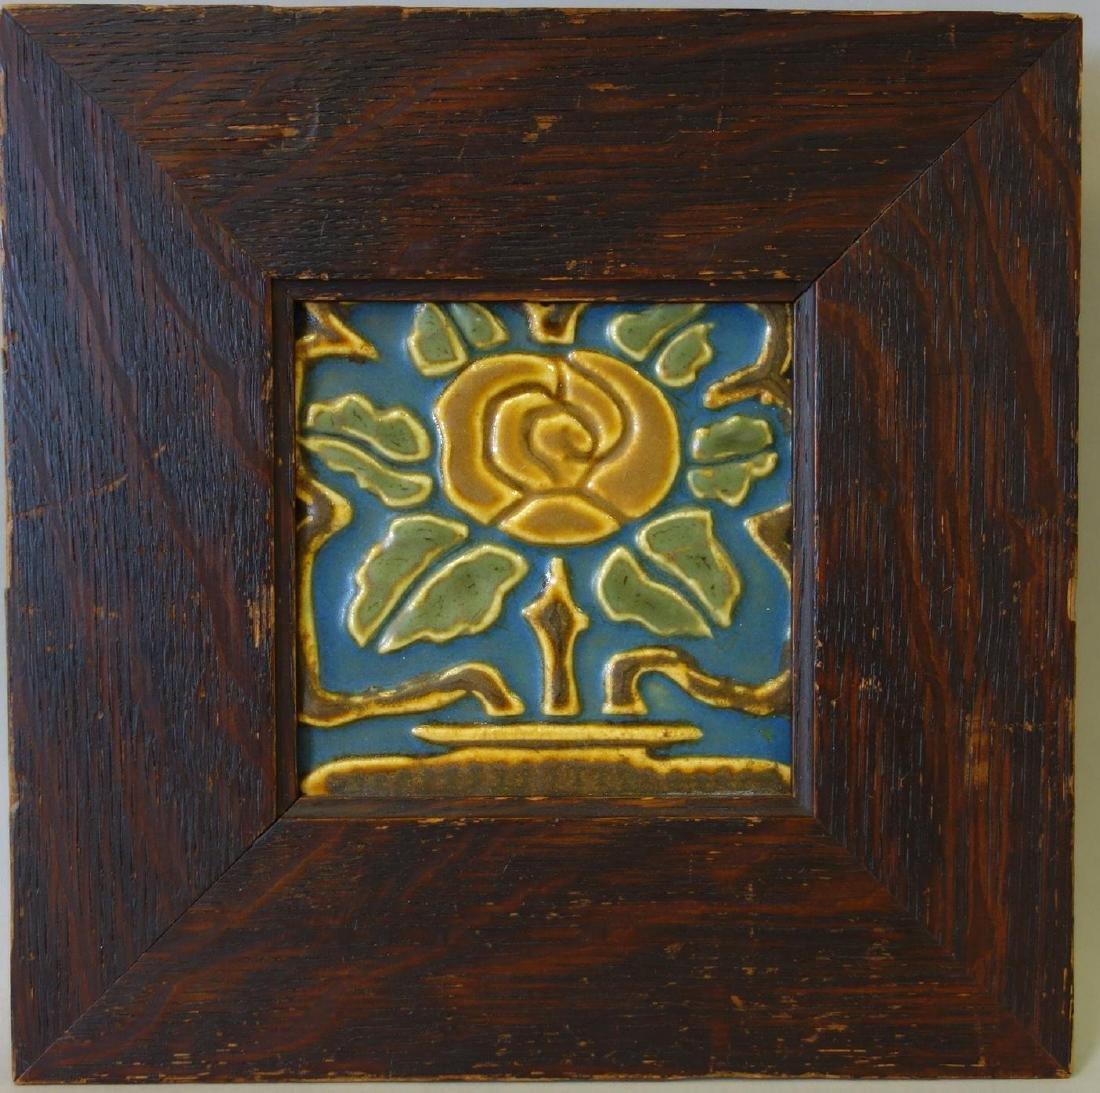 Rookwood Pottery Faience Tile in Oak Frame